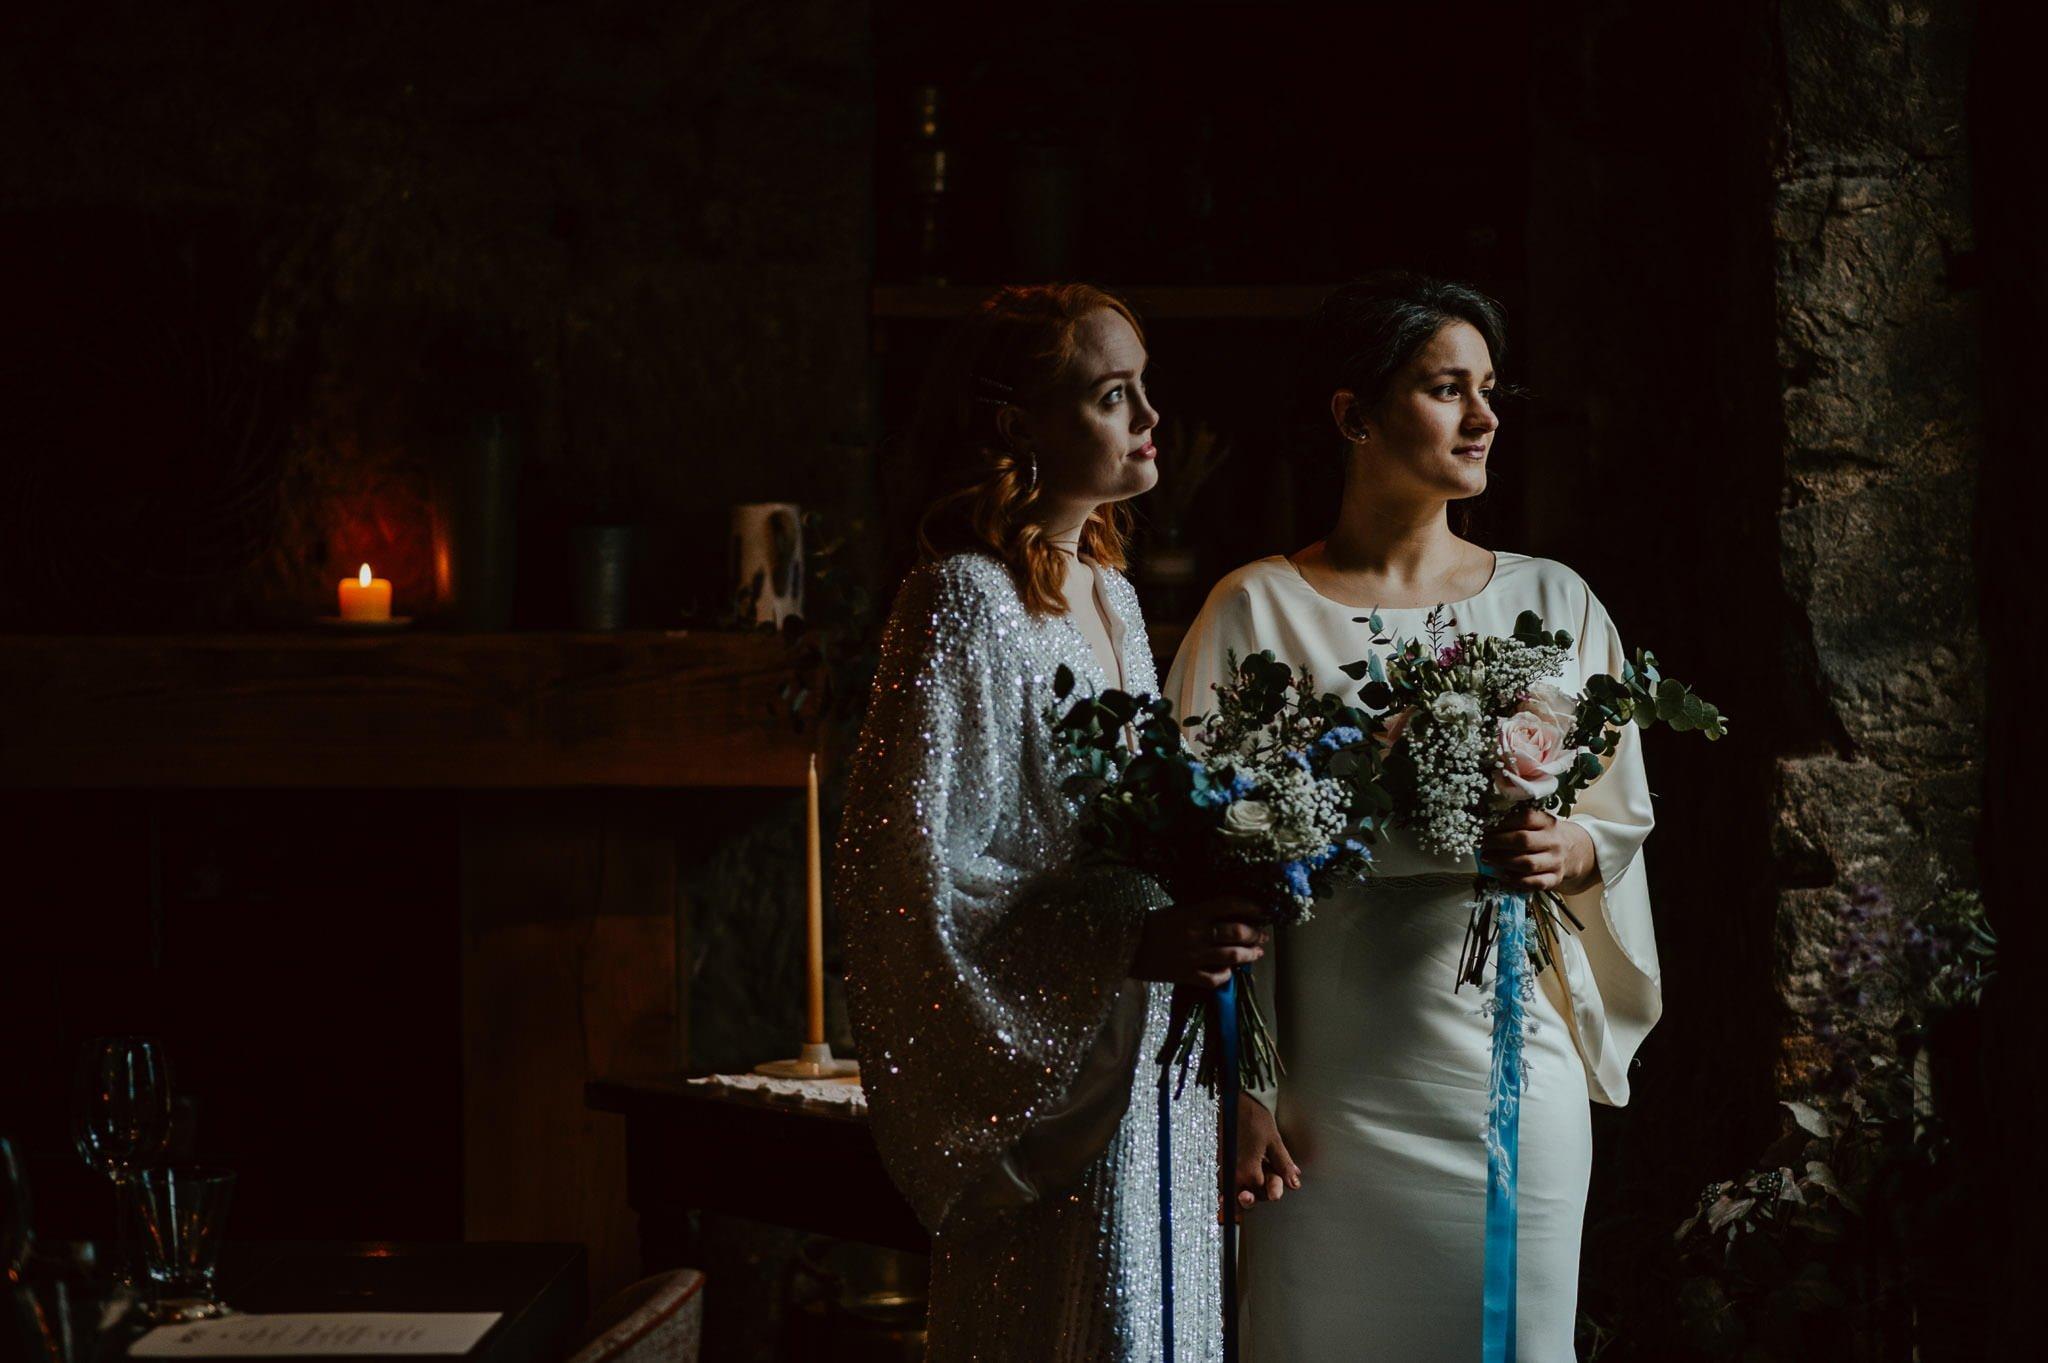 A Dreamy Pre-Raphaelite Wedding at the Bothy in Glasgow 6